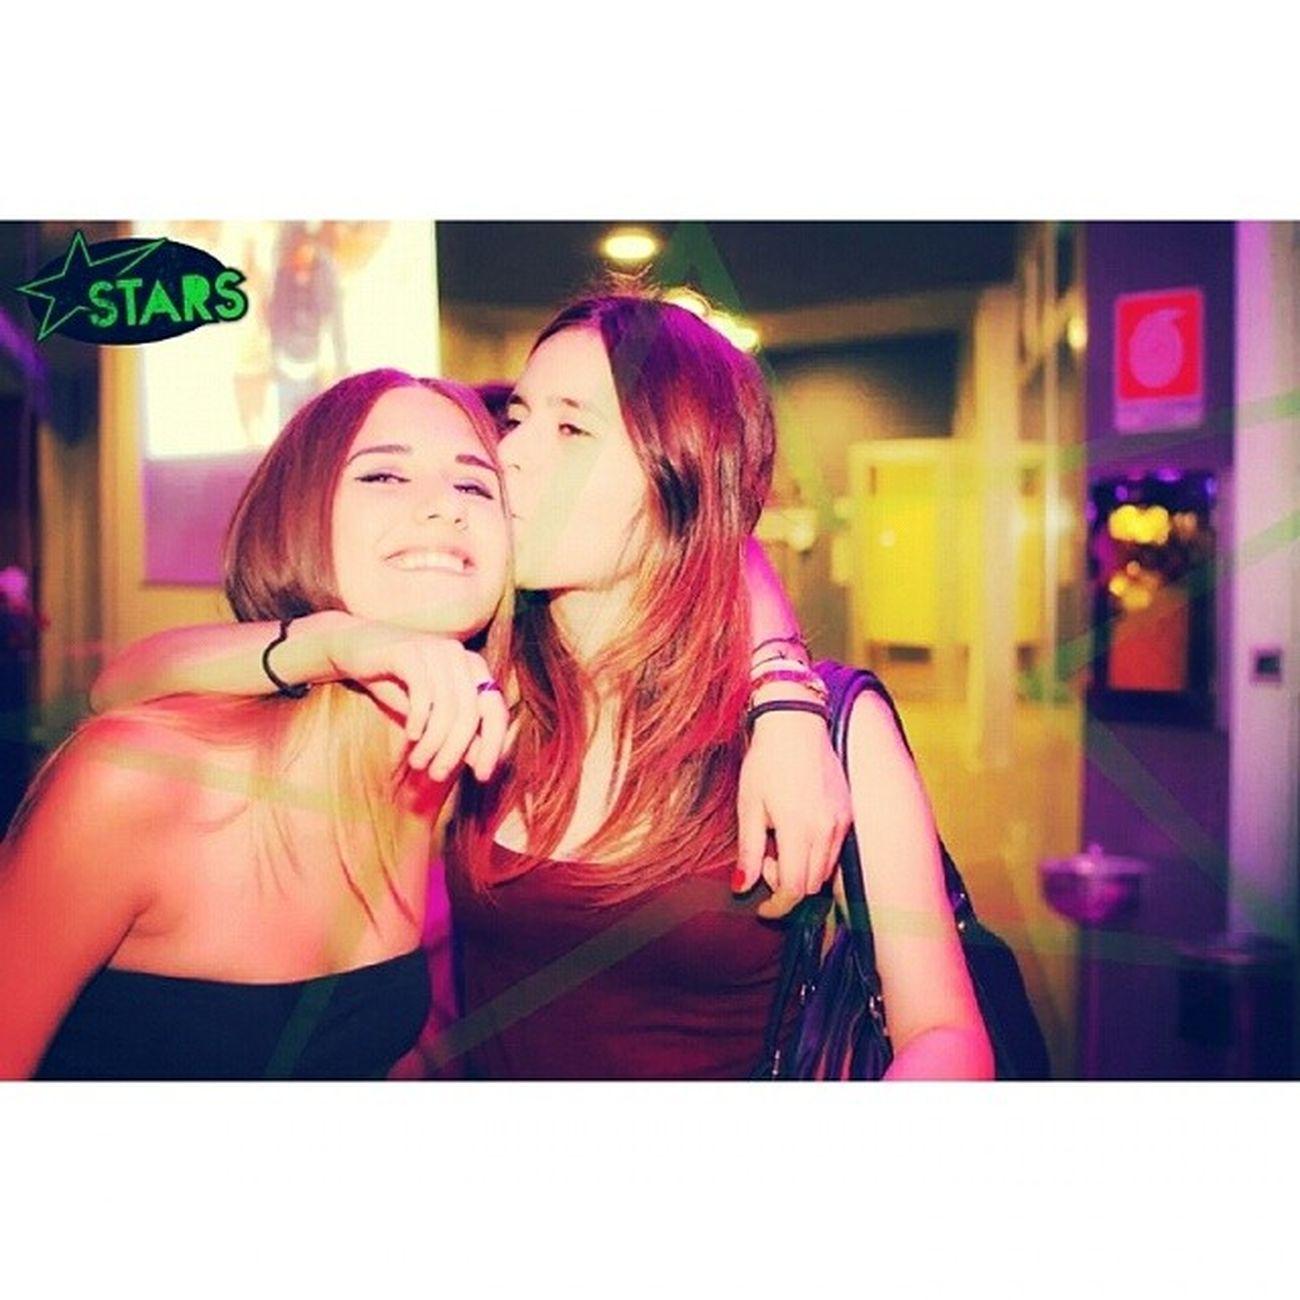 Party Saturdaynigt Vanilla Claudia loveya lotoffun wannabeseventeenforever summer enjoy